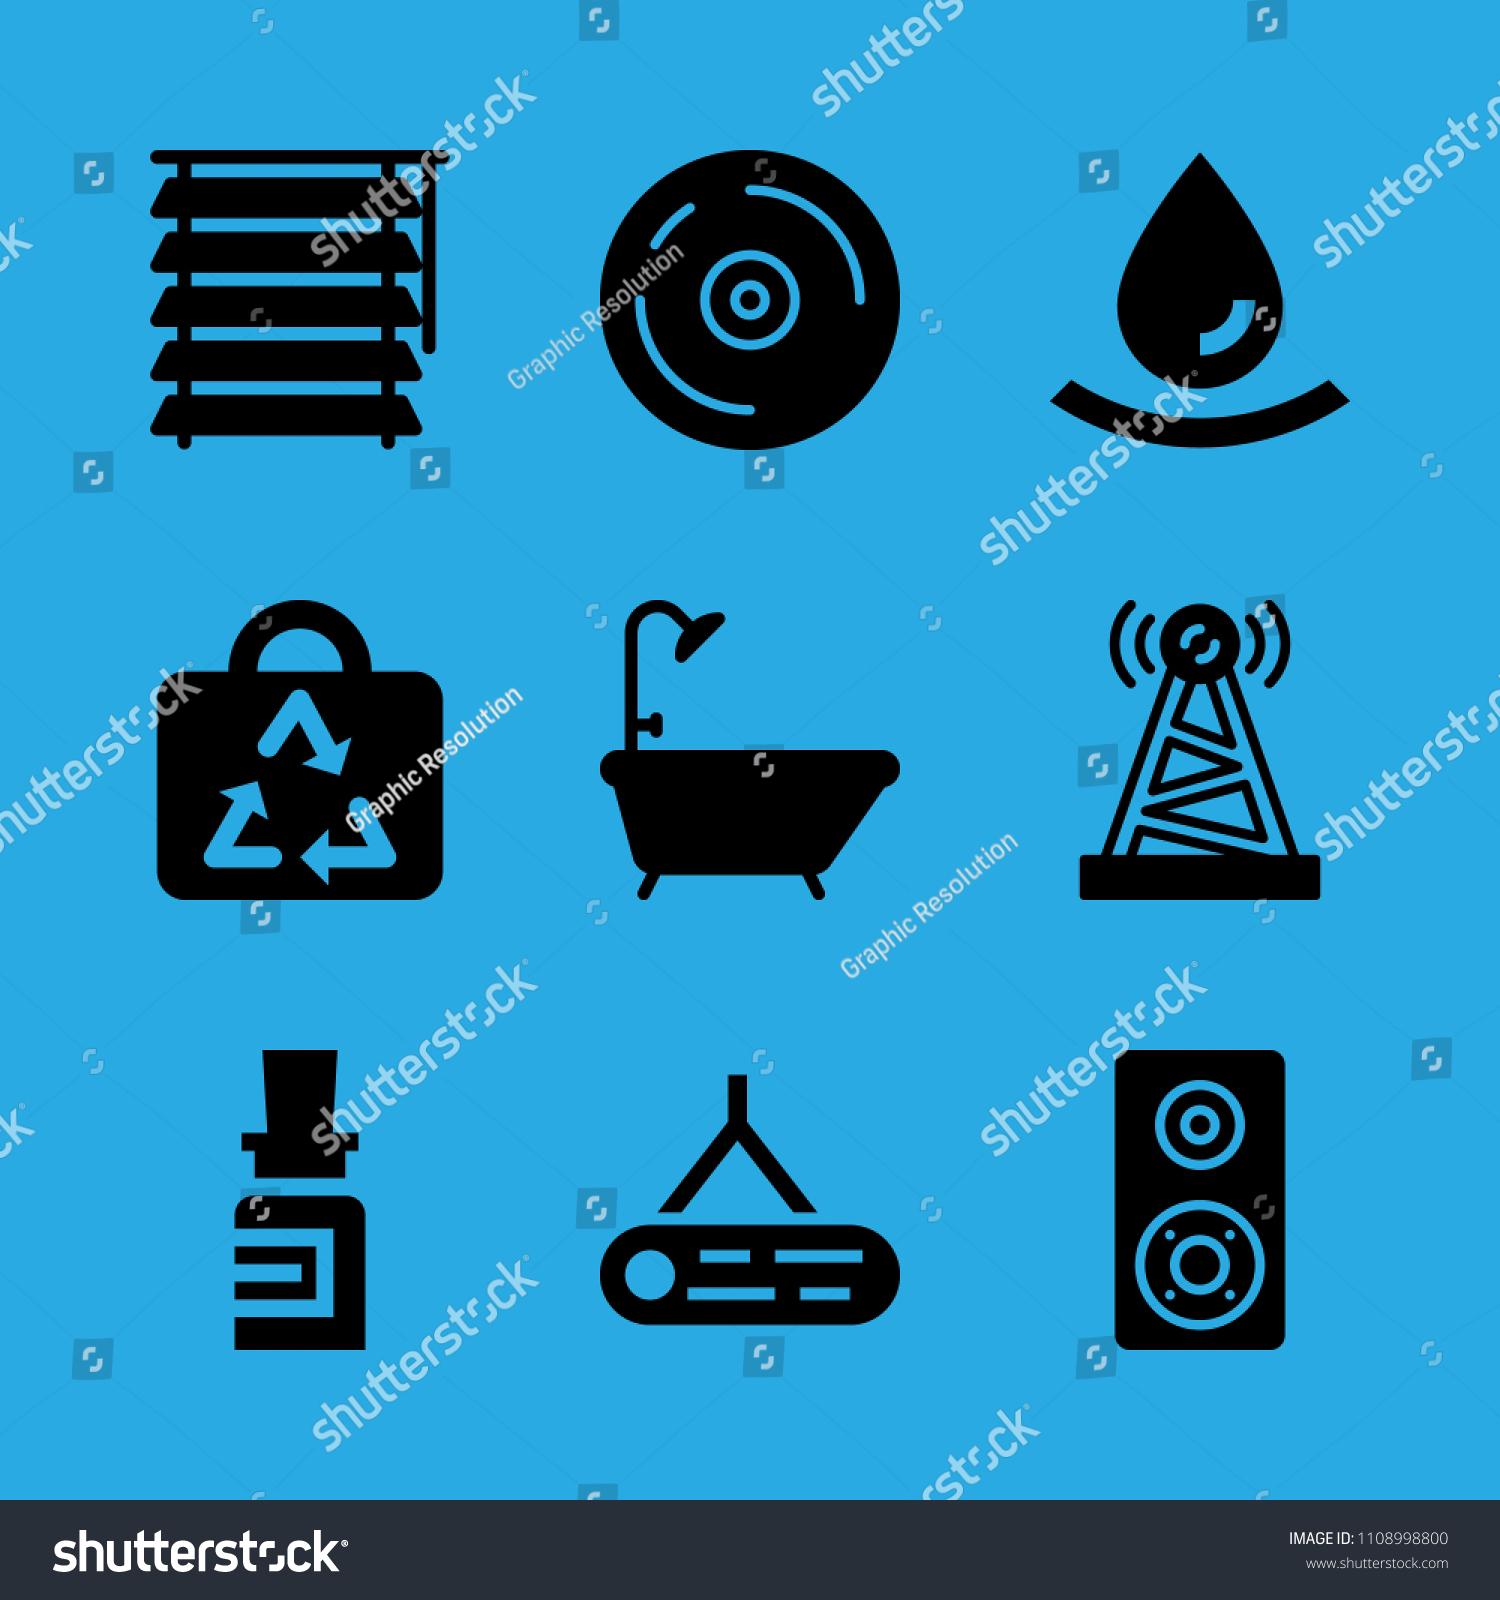 Antenna Medicine Drop Bag Blind Bathtub Stock Vector 1108998800 ...